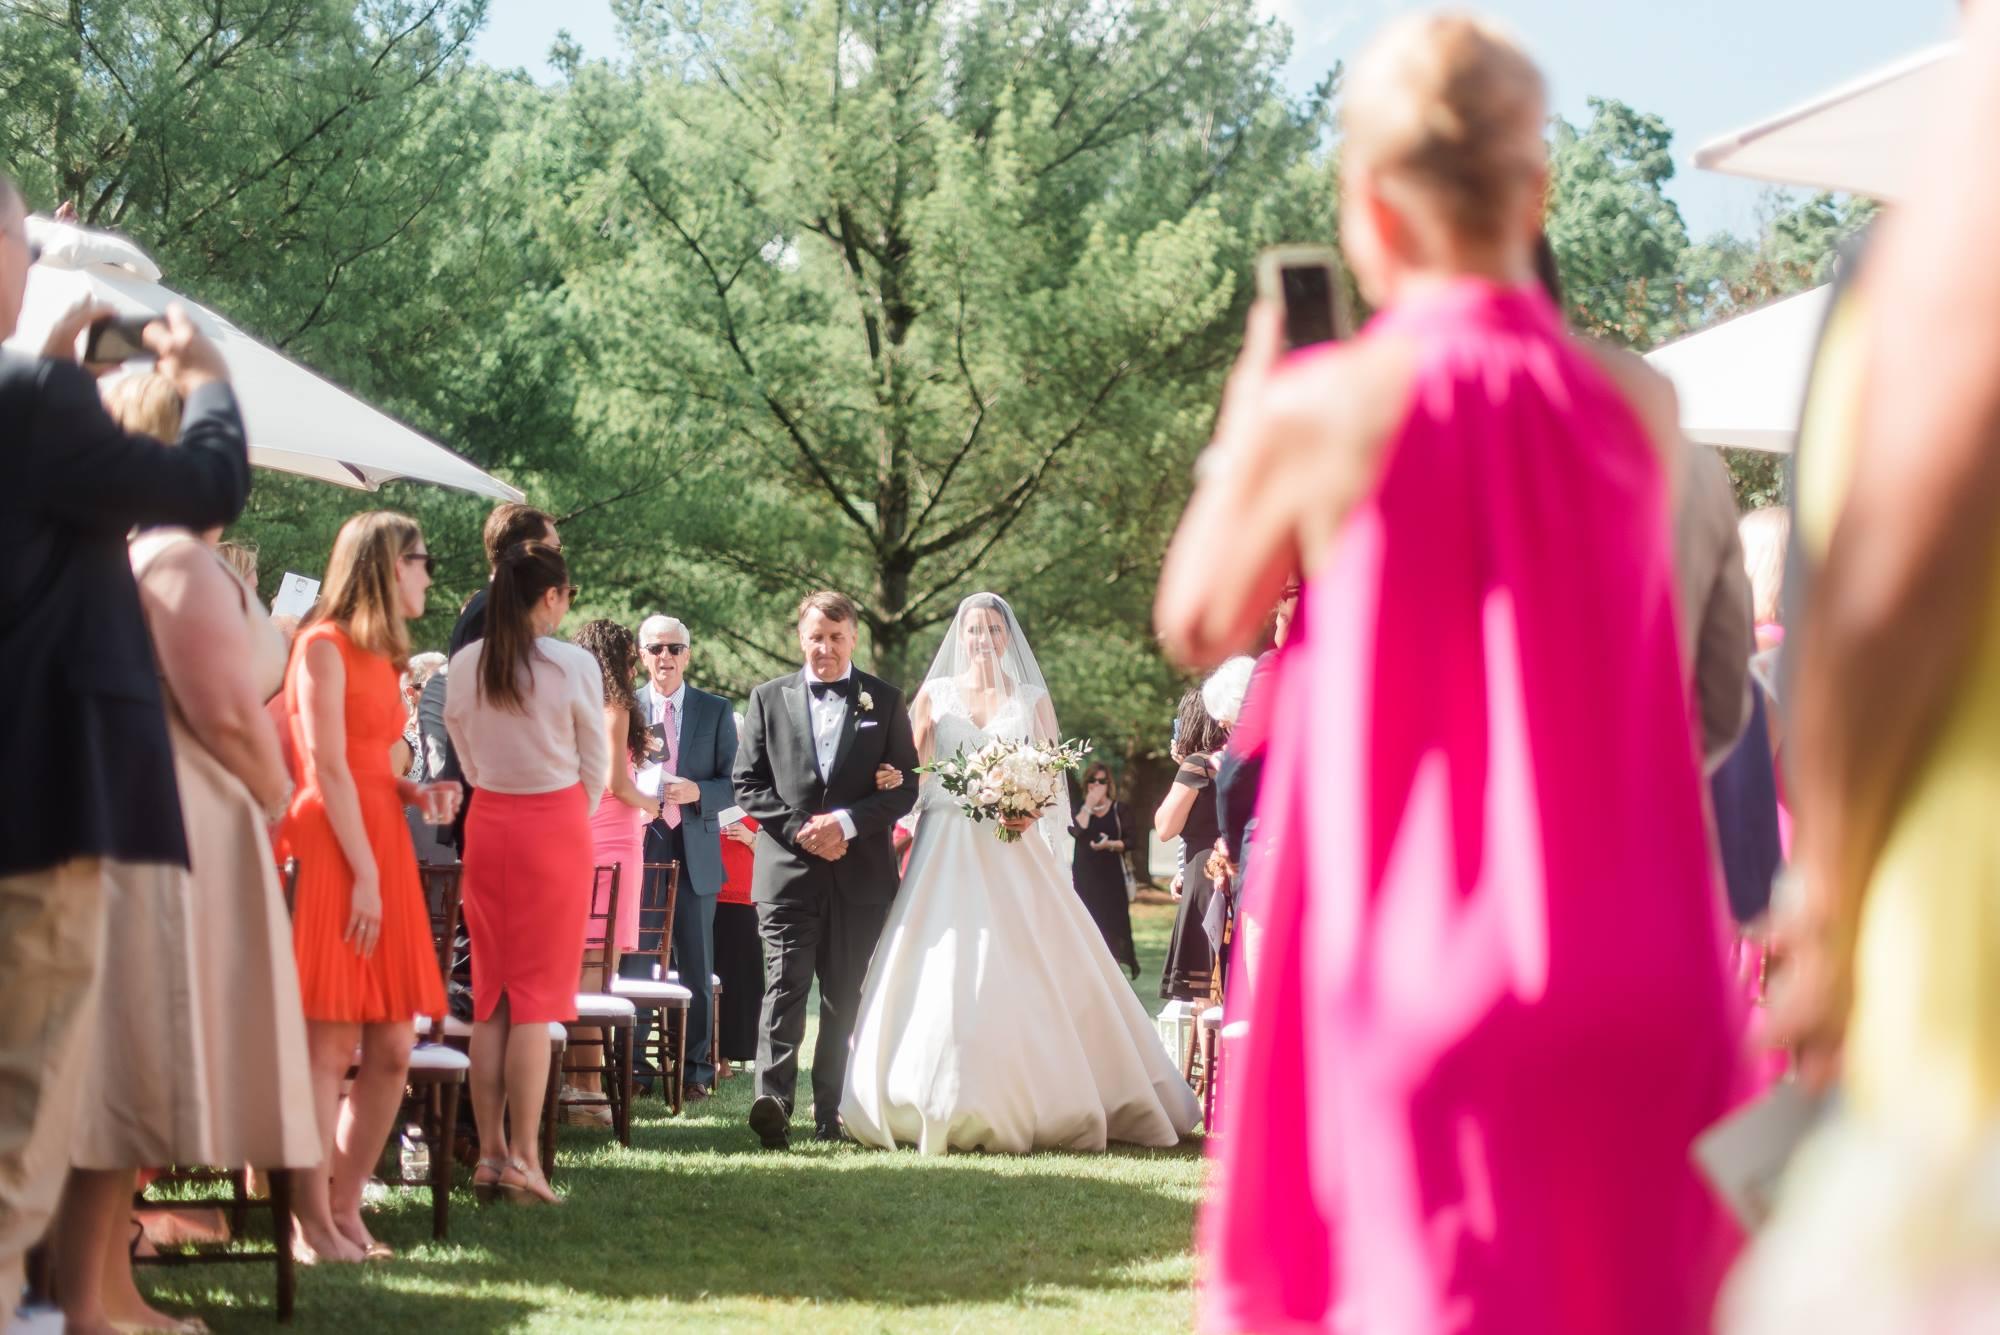 pittsburgh-pennsylvania-backyard-glam-chic-modern-classic-wedding-0022.jpg